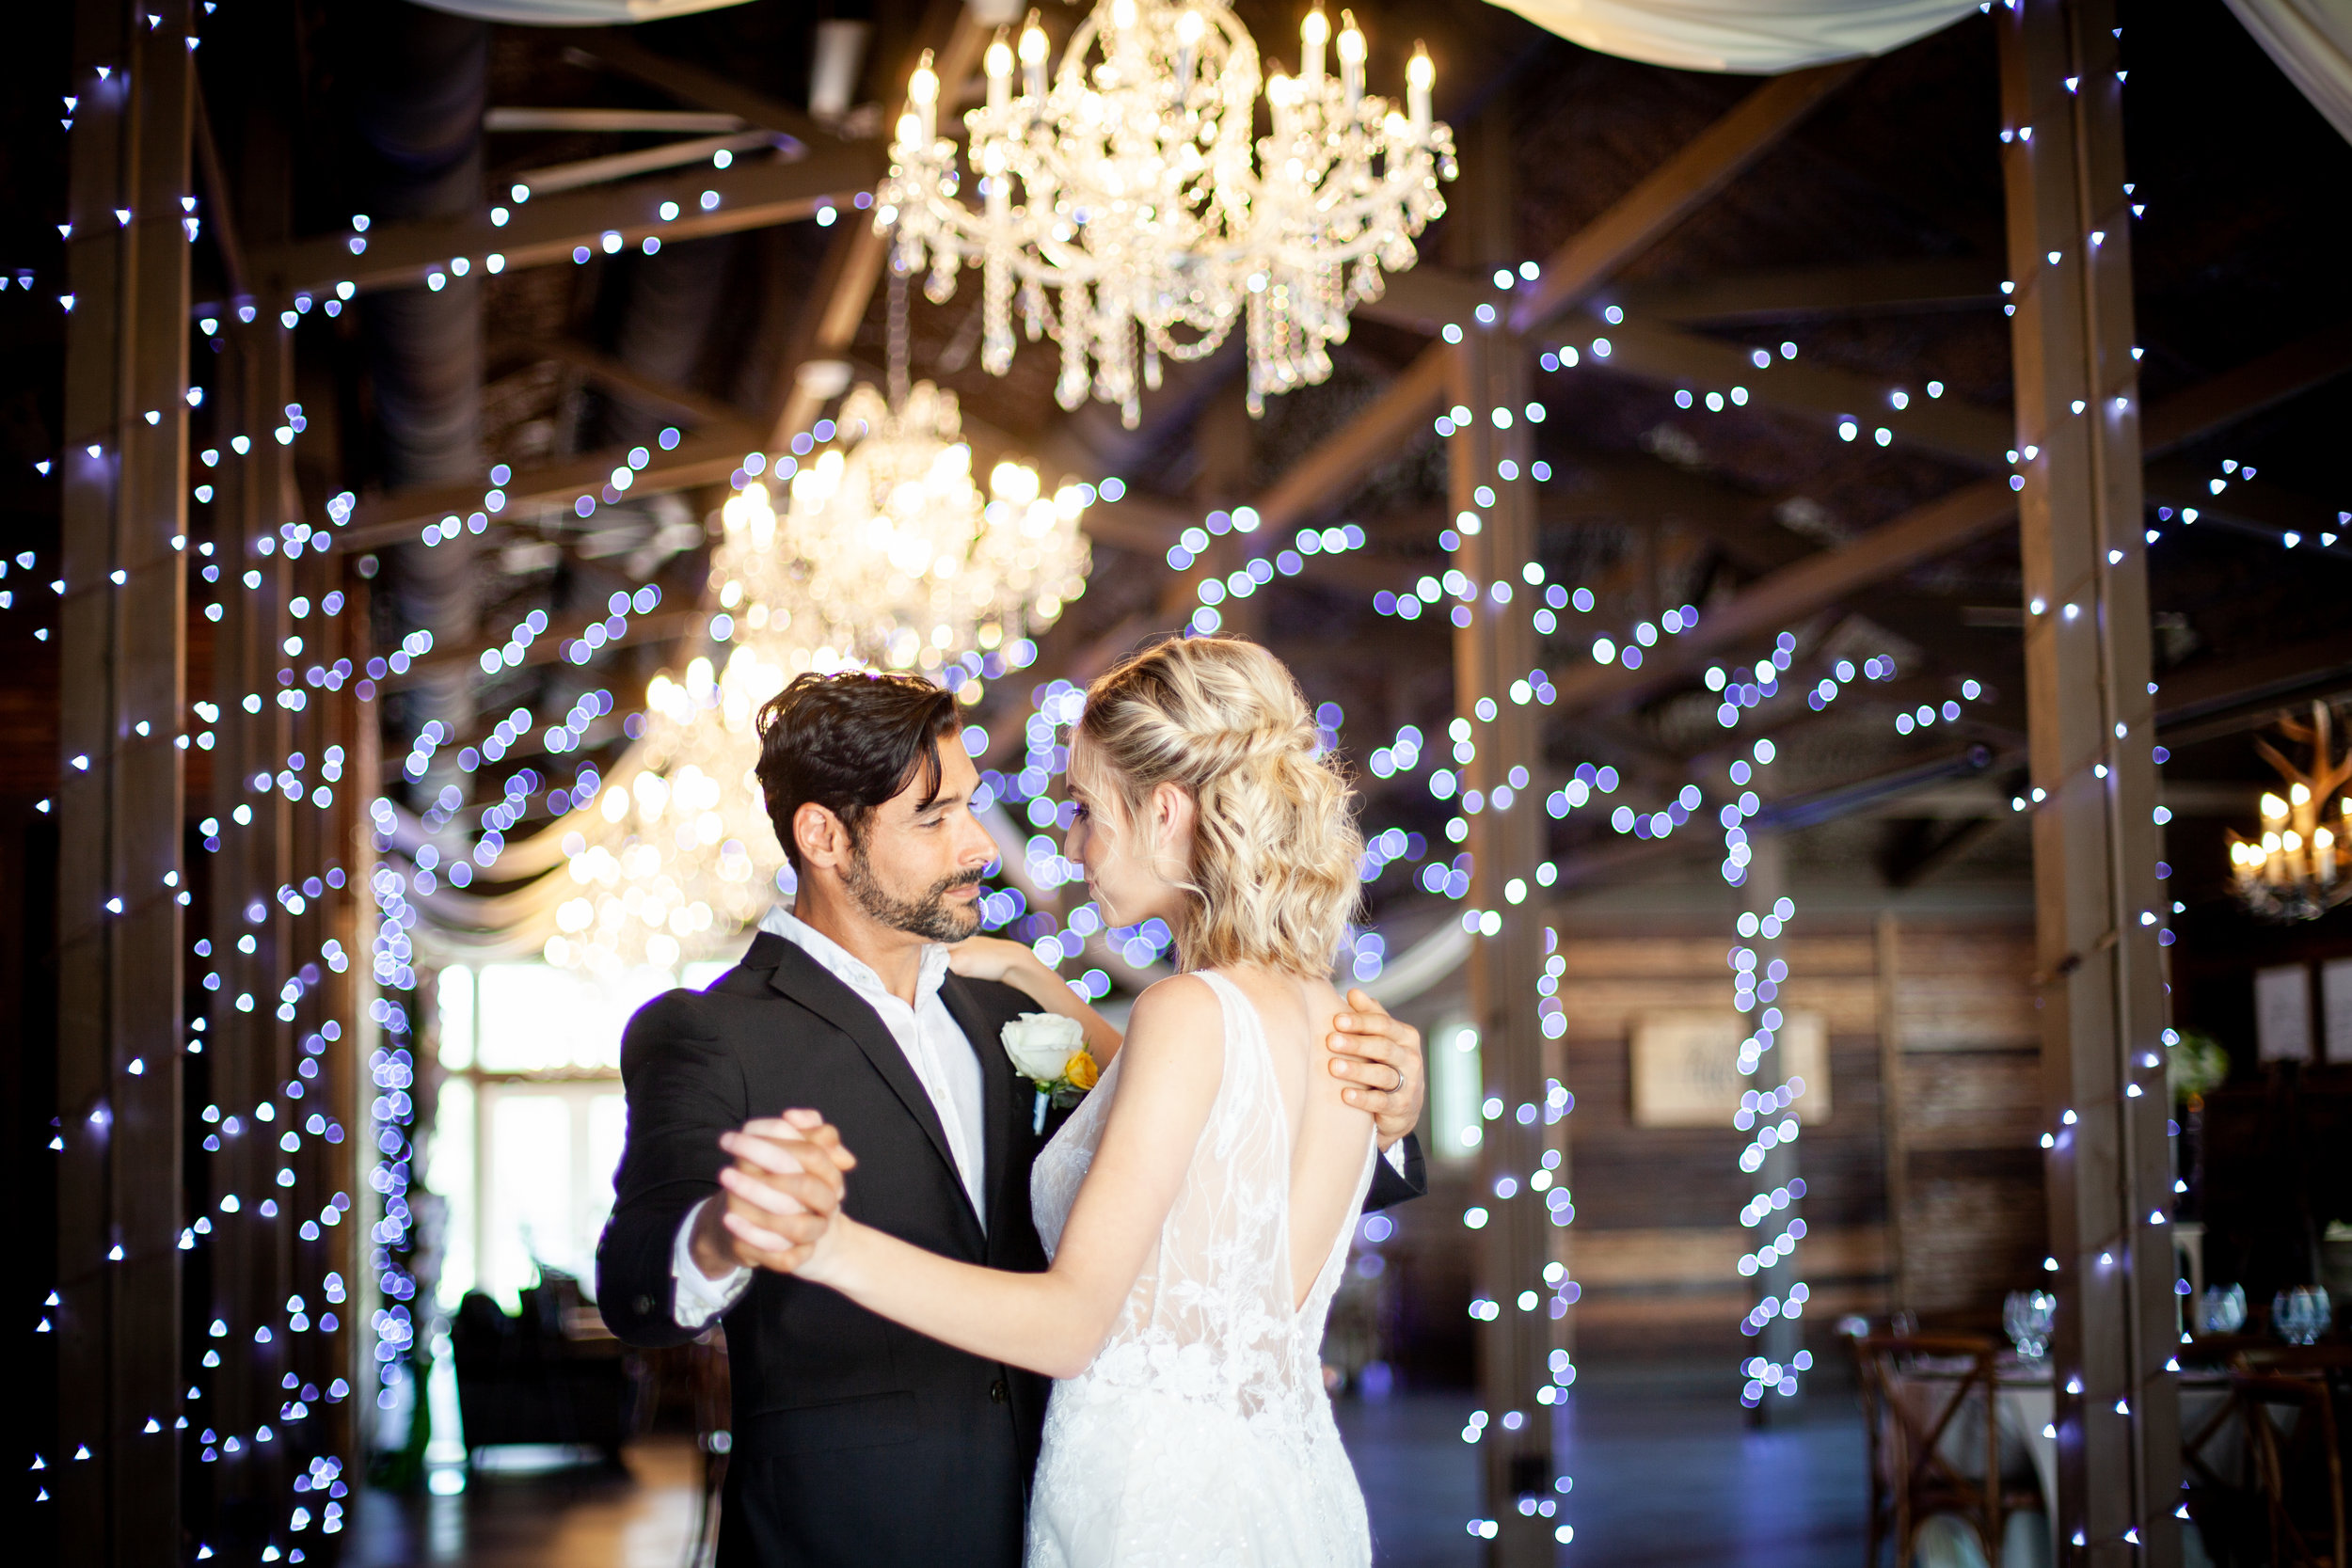 kelilina photography and films florida wedding photography videography 004-5.jpg